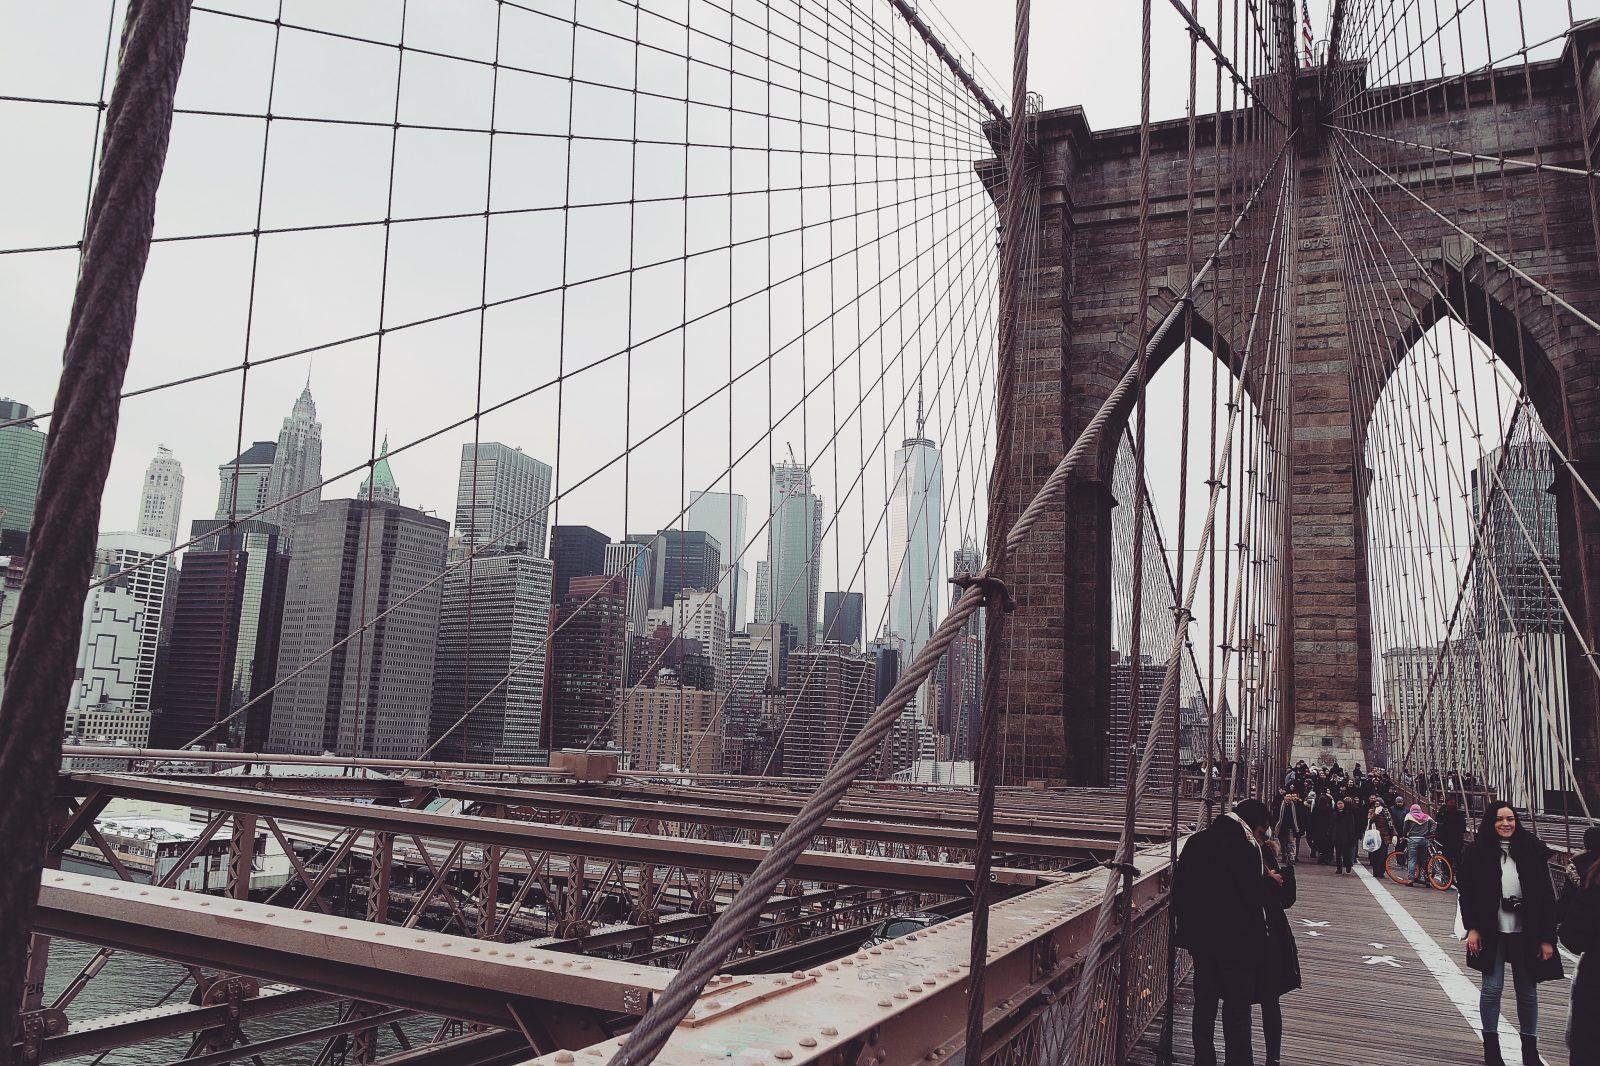 New York in 4 Days - The Brooklyn Bridge